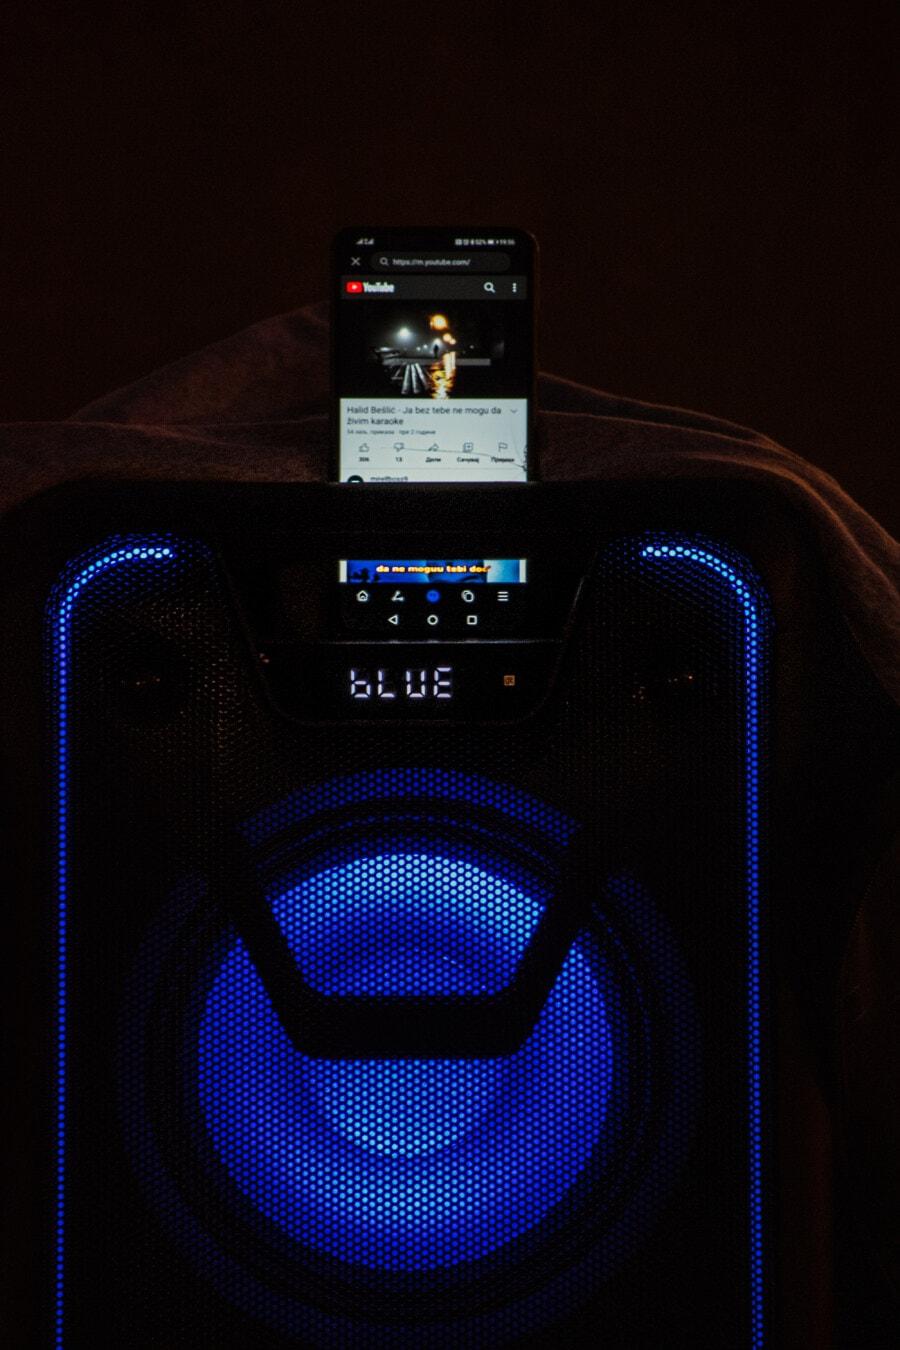 drahtlose, Lautsprecher, Mobiltelefon, Verstärker, Song, Musik, Technologie, Ausrüstung, Elektronik, Intensität